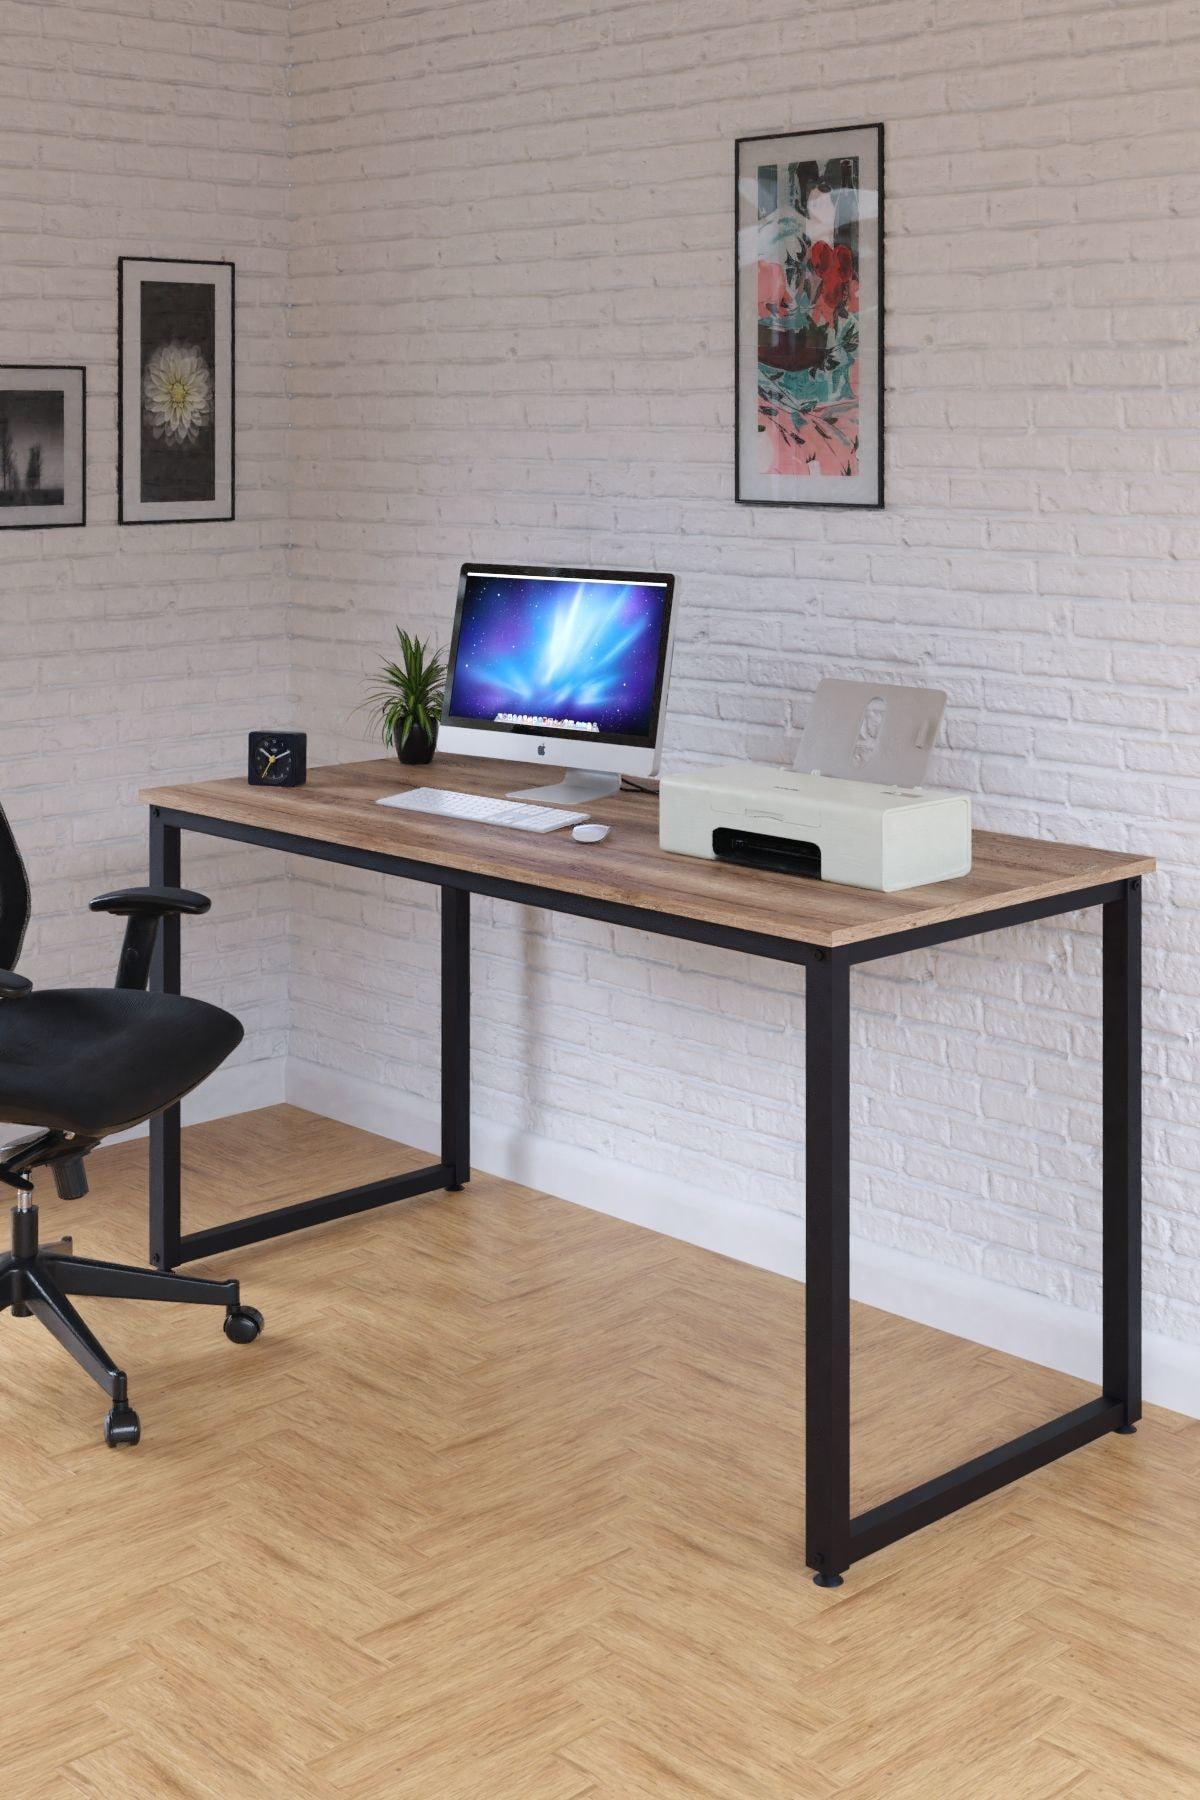 Çalışma Masası, Bilgisayar Masası, Ofis Masası (60x140 Cm, Sakremento)